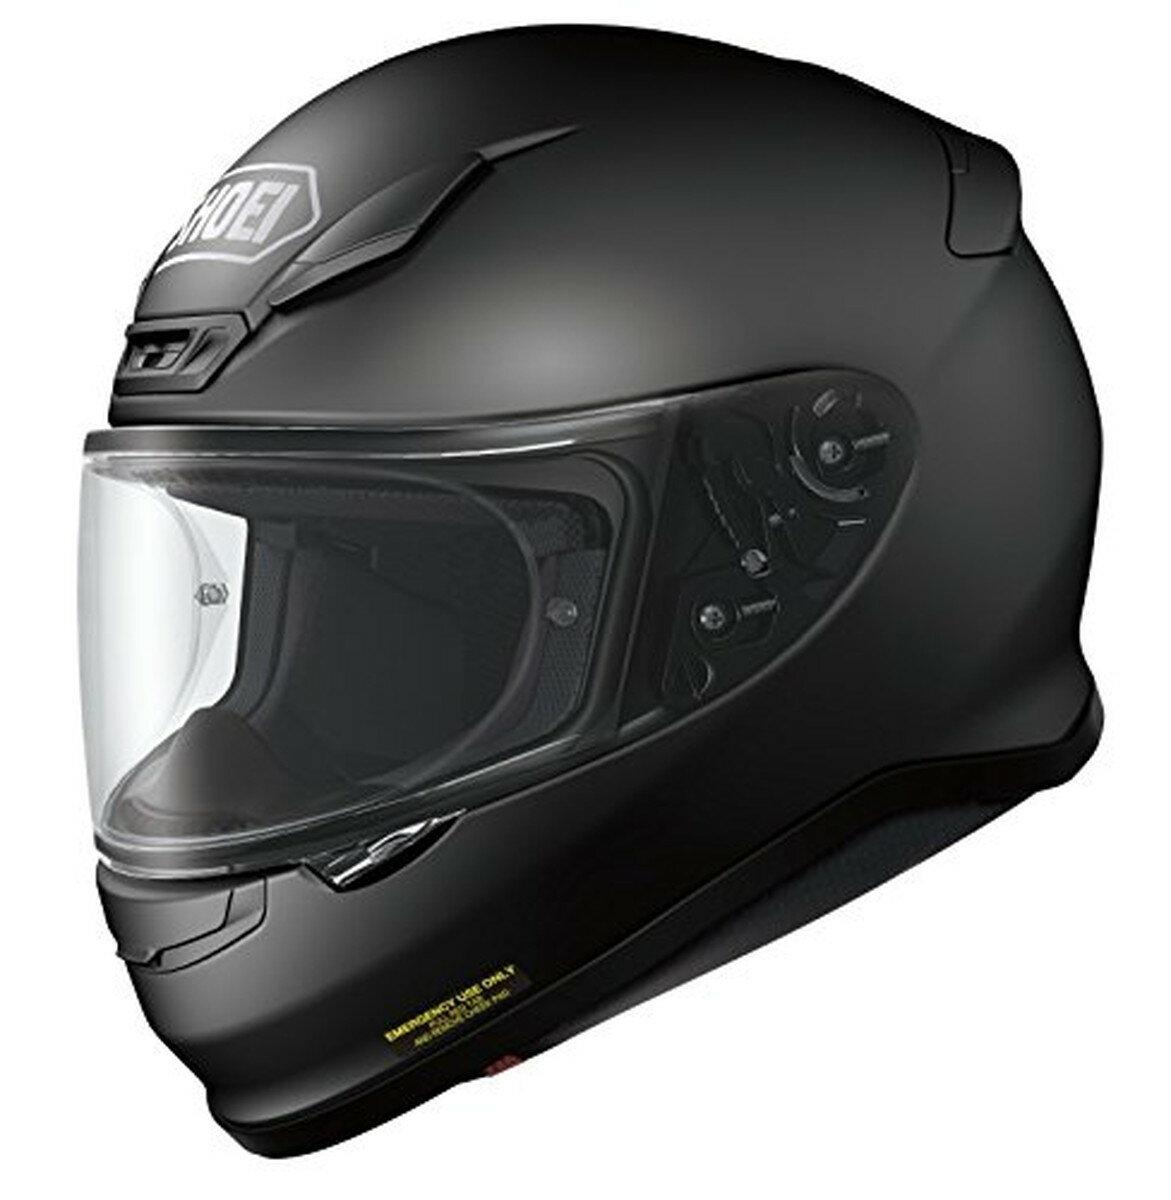 SHOEI フルフェイスヘルメット Z-7 Z7 (ゼット-セブン) マットブラック Mサイズ